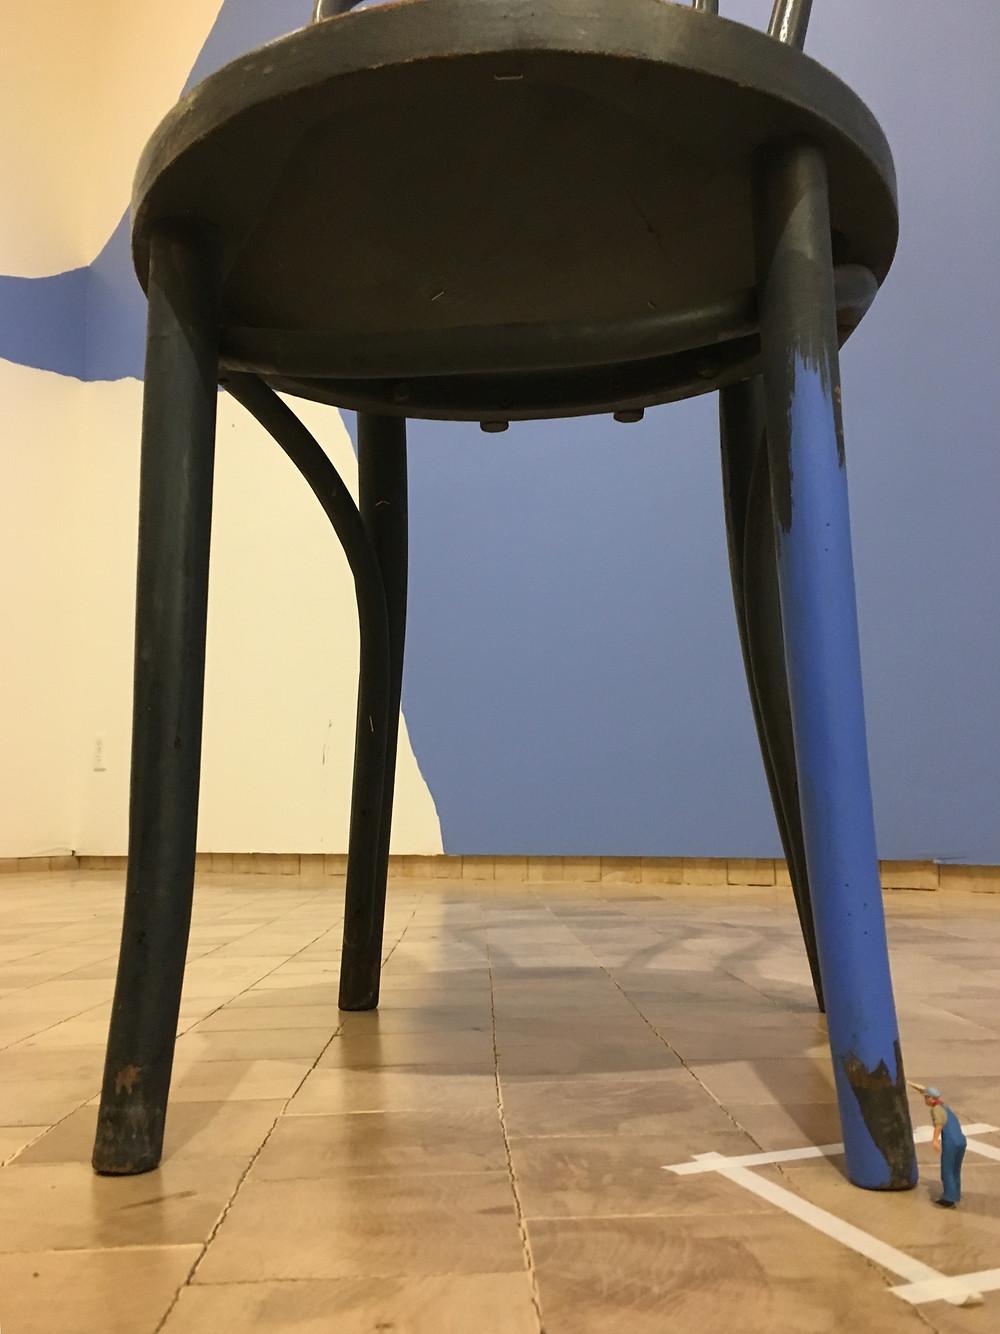 Untitled (Man Painting Chair III), 2015, Liliana Porter